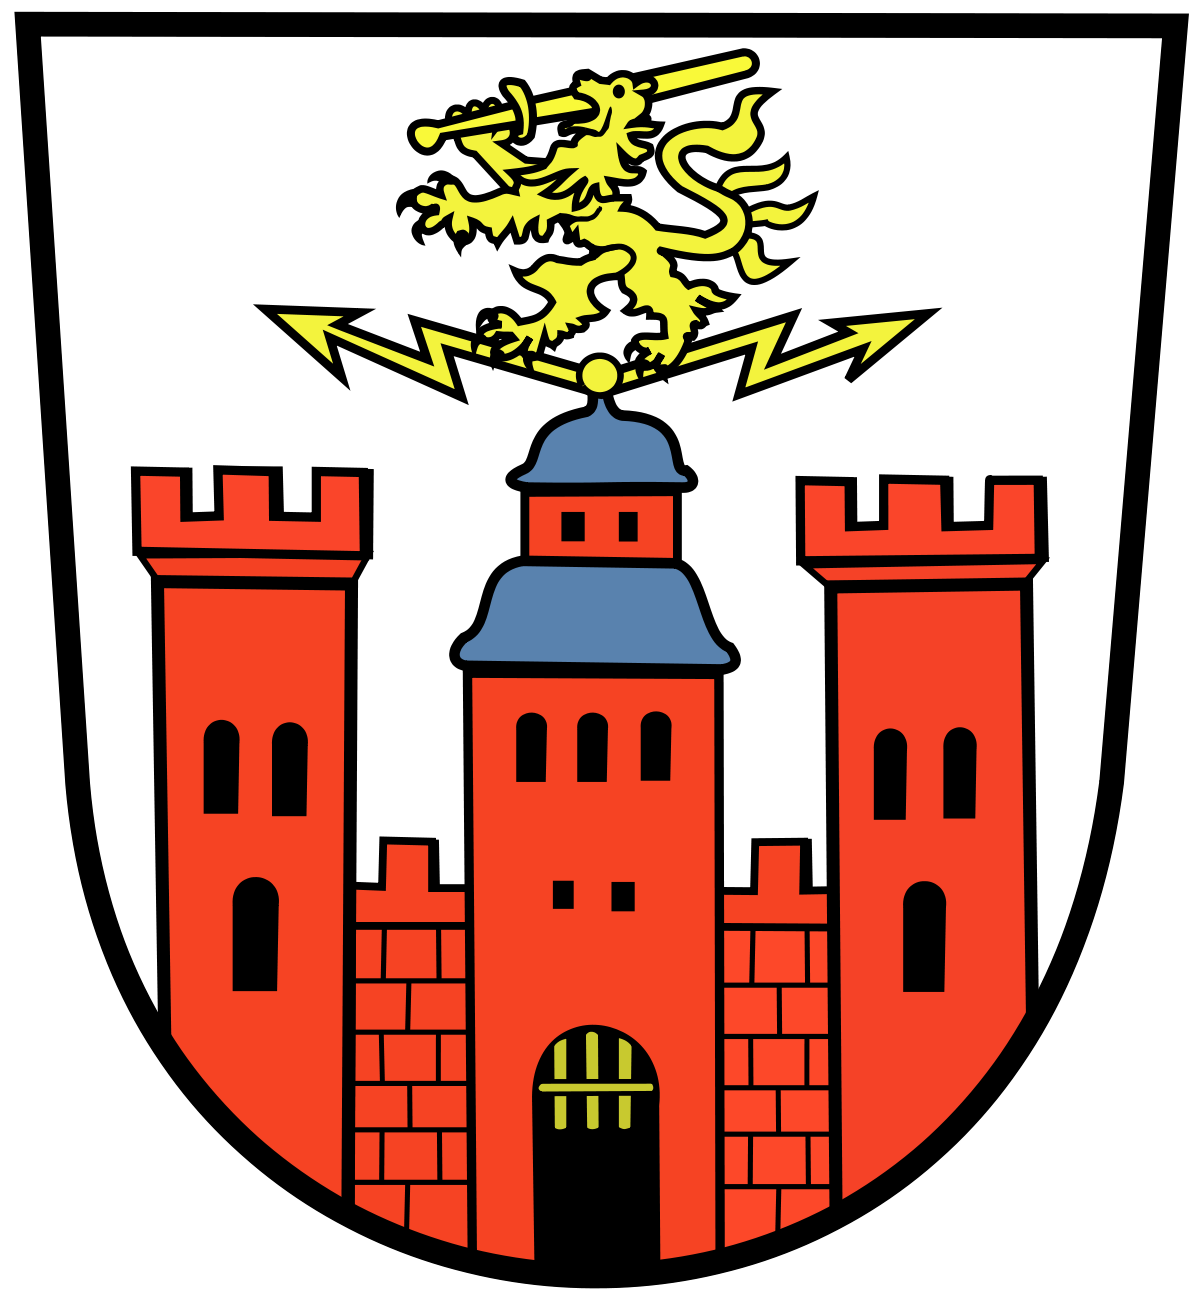 Geschichte der Stadt Pirmasens.